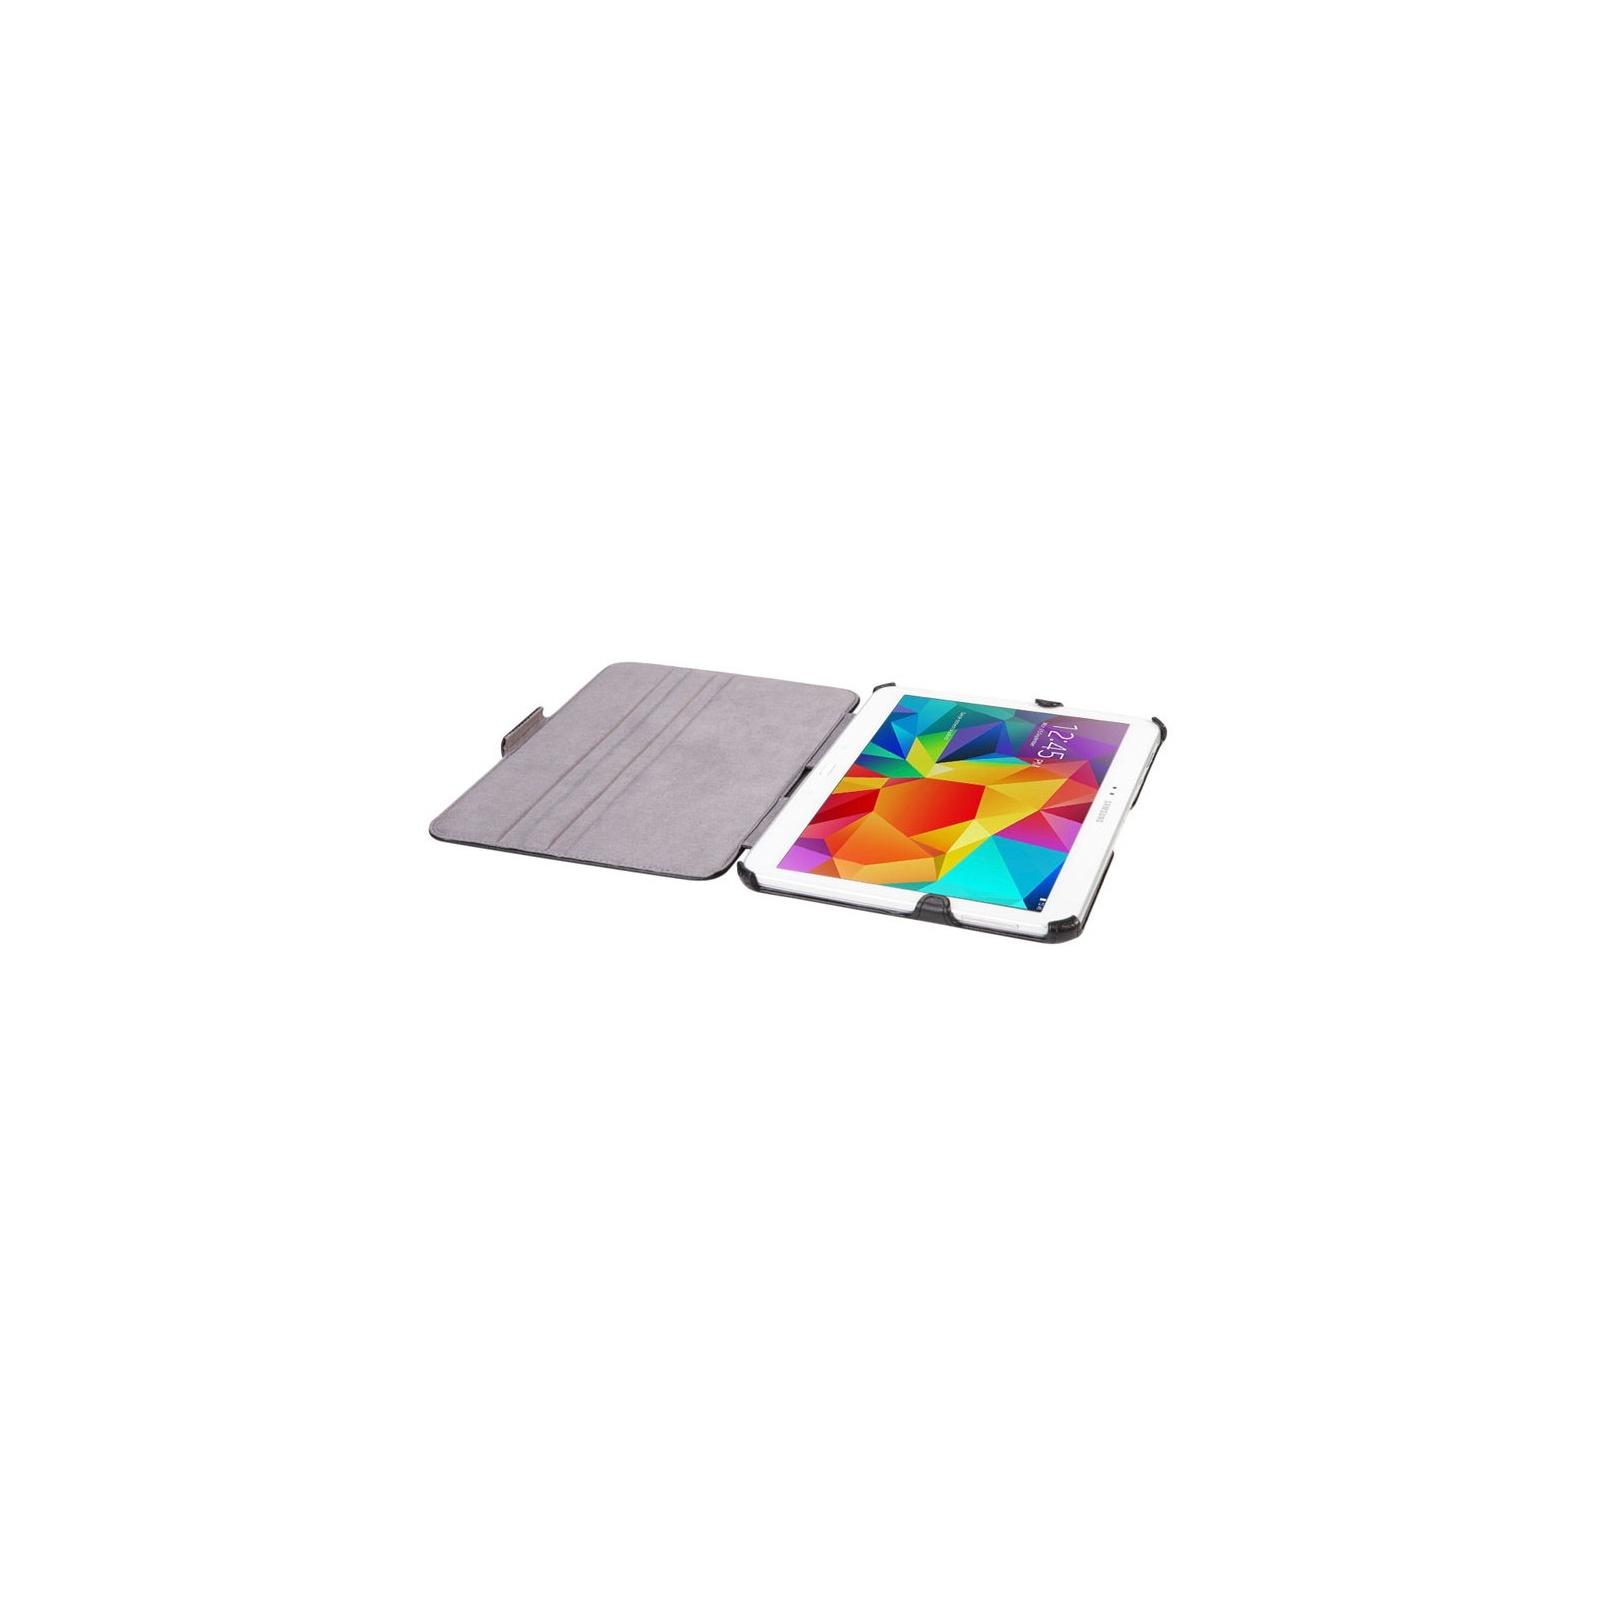 Чехол для планшета AirOn для Samsung GALAXY Tab 4 10.1 black (6946795850175) изображение 3